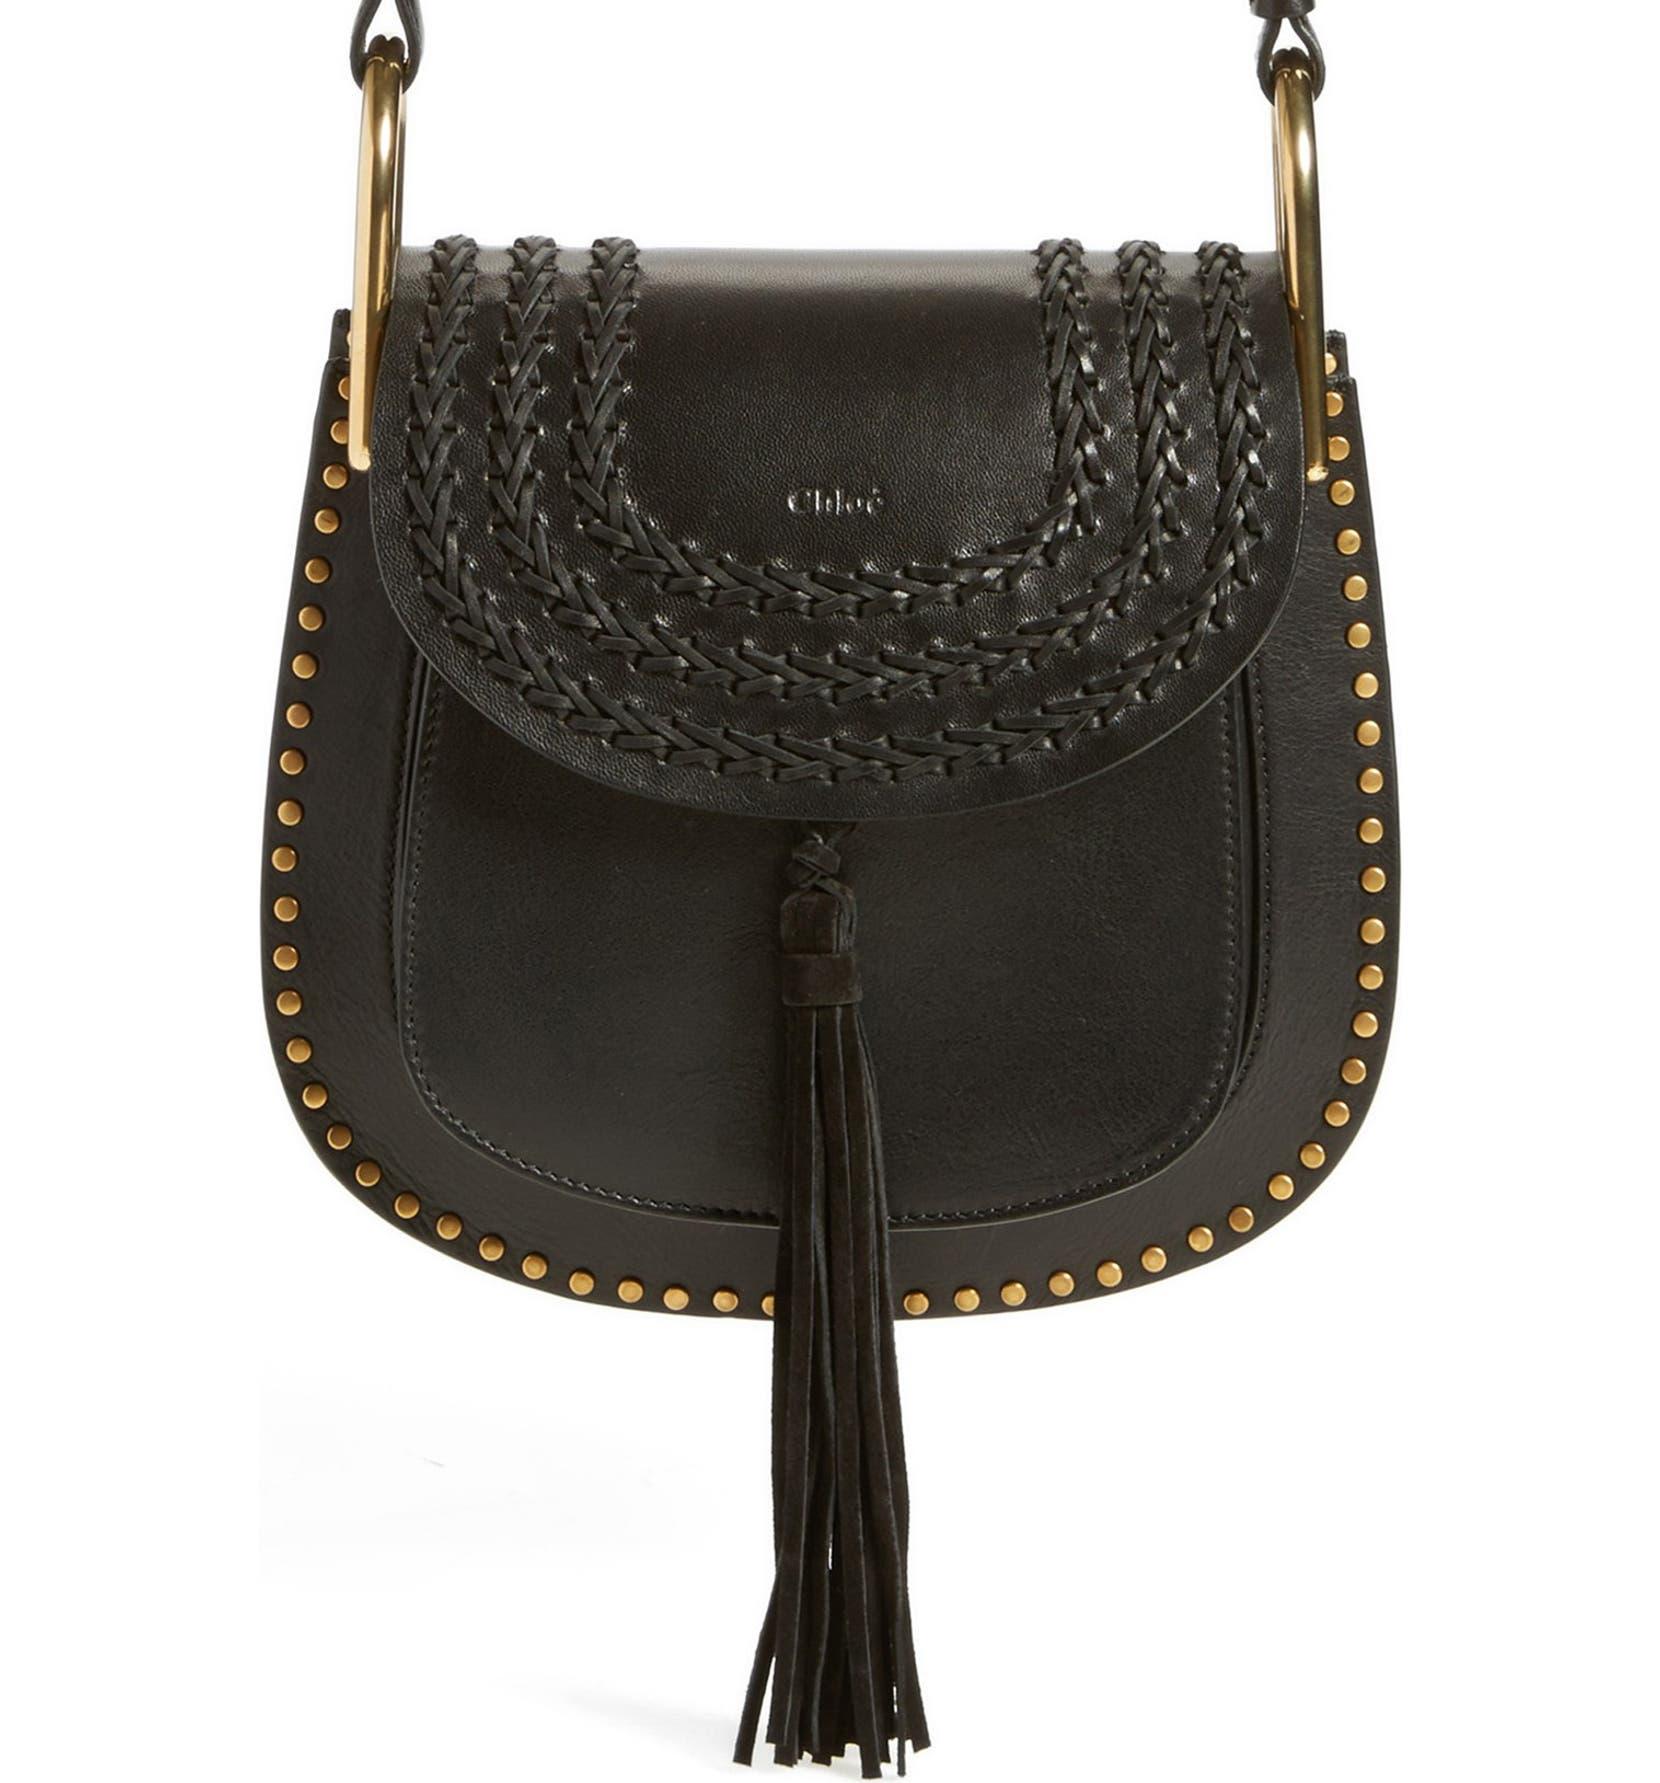 6bcc809f3f5 Chloé  Small Hudson  Studded Calfskin Leather Crossbody Bag